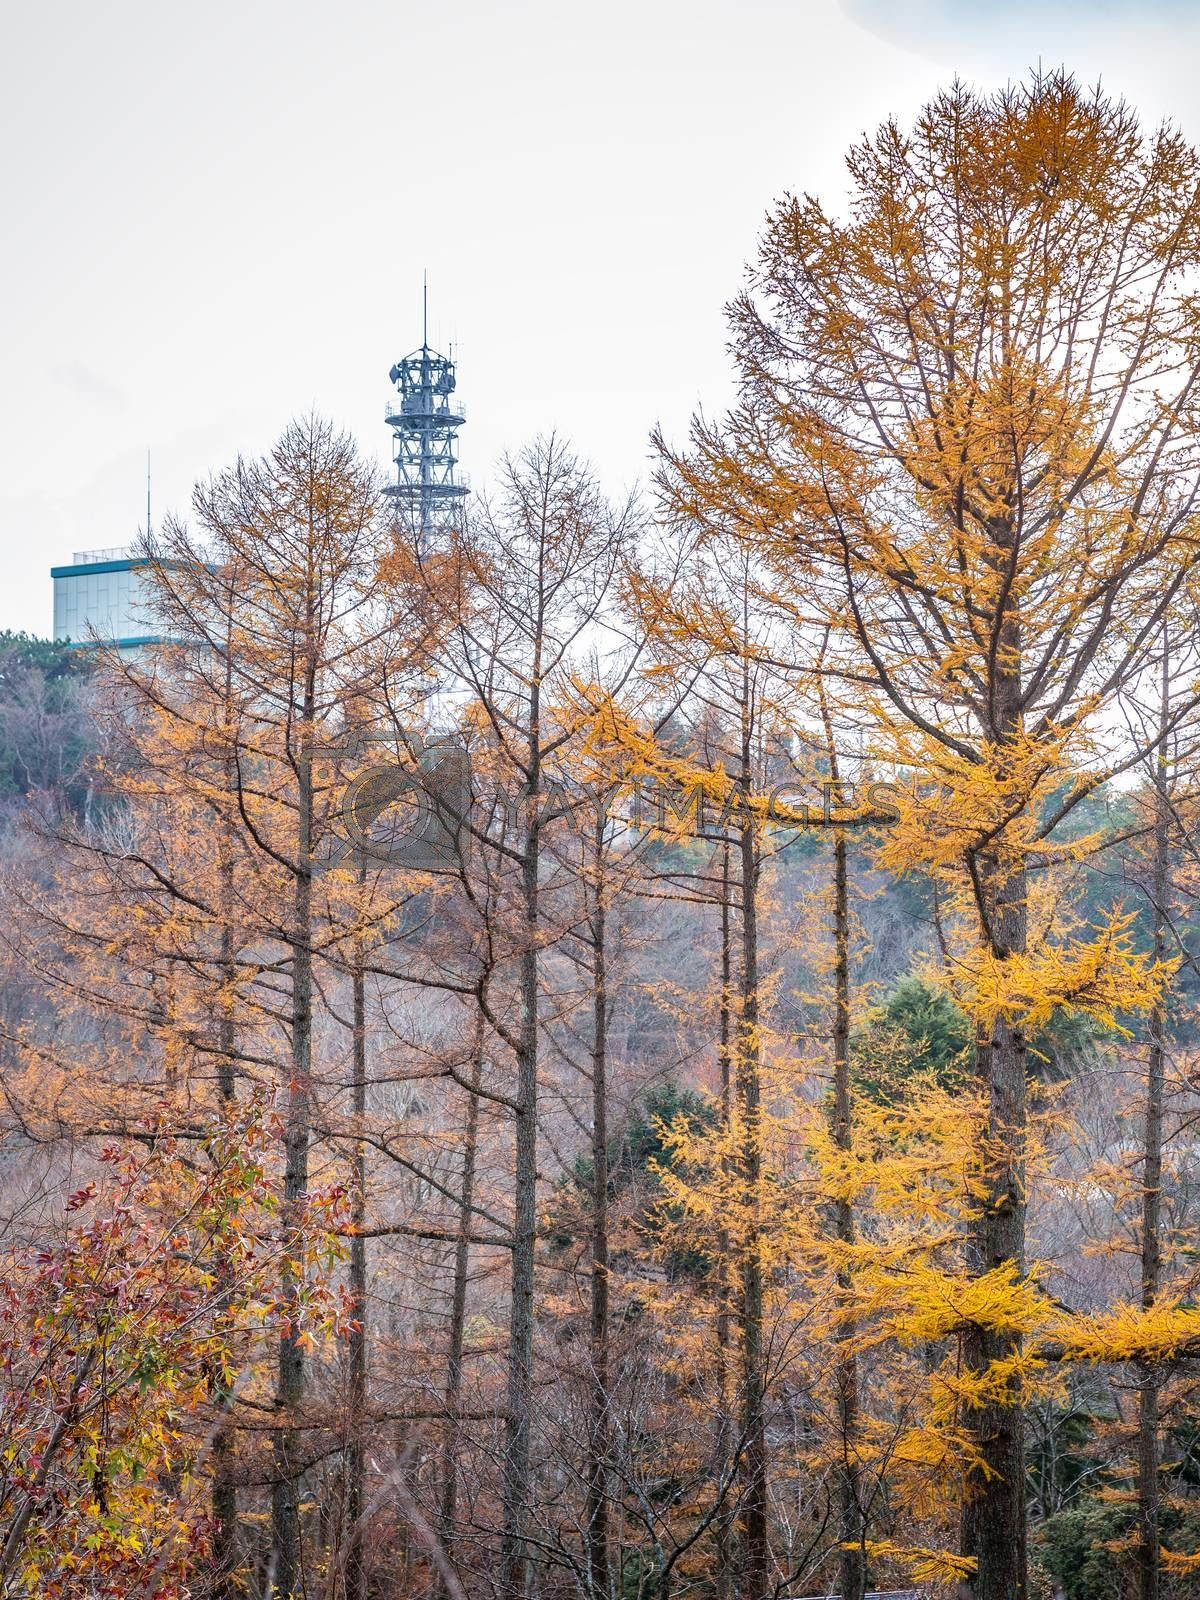 Pine trees changing color from green to orange during autumn inside Mount Rokko of Kobe, Hyogo, Kansai, Japan.